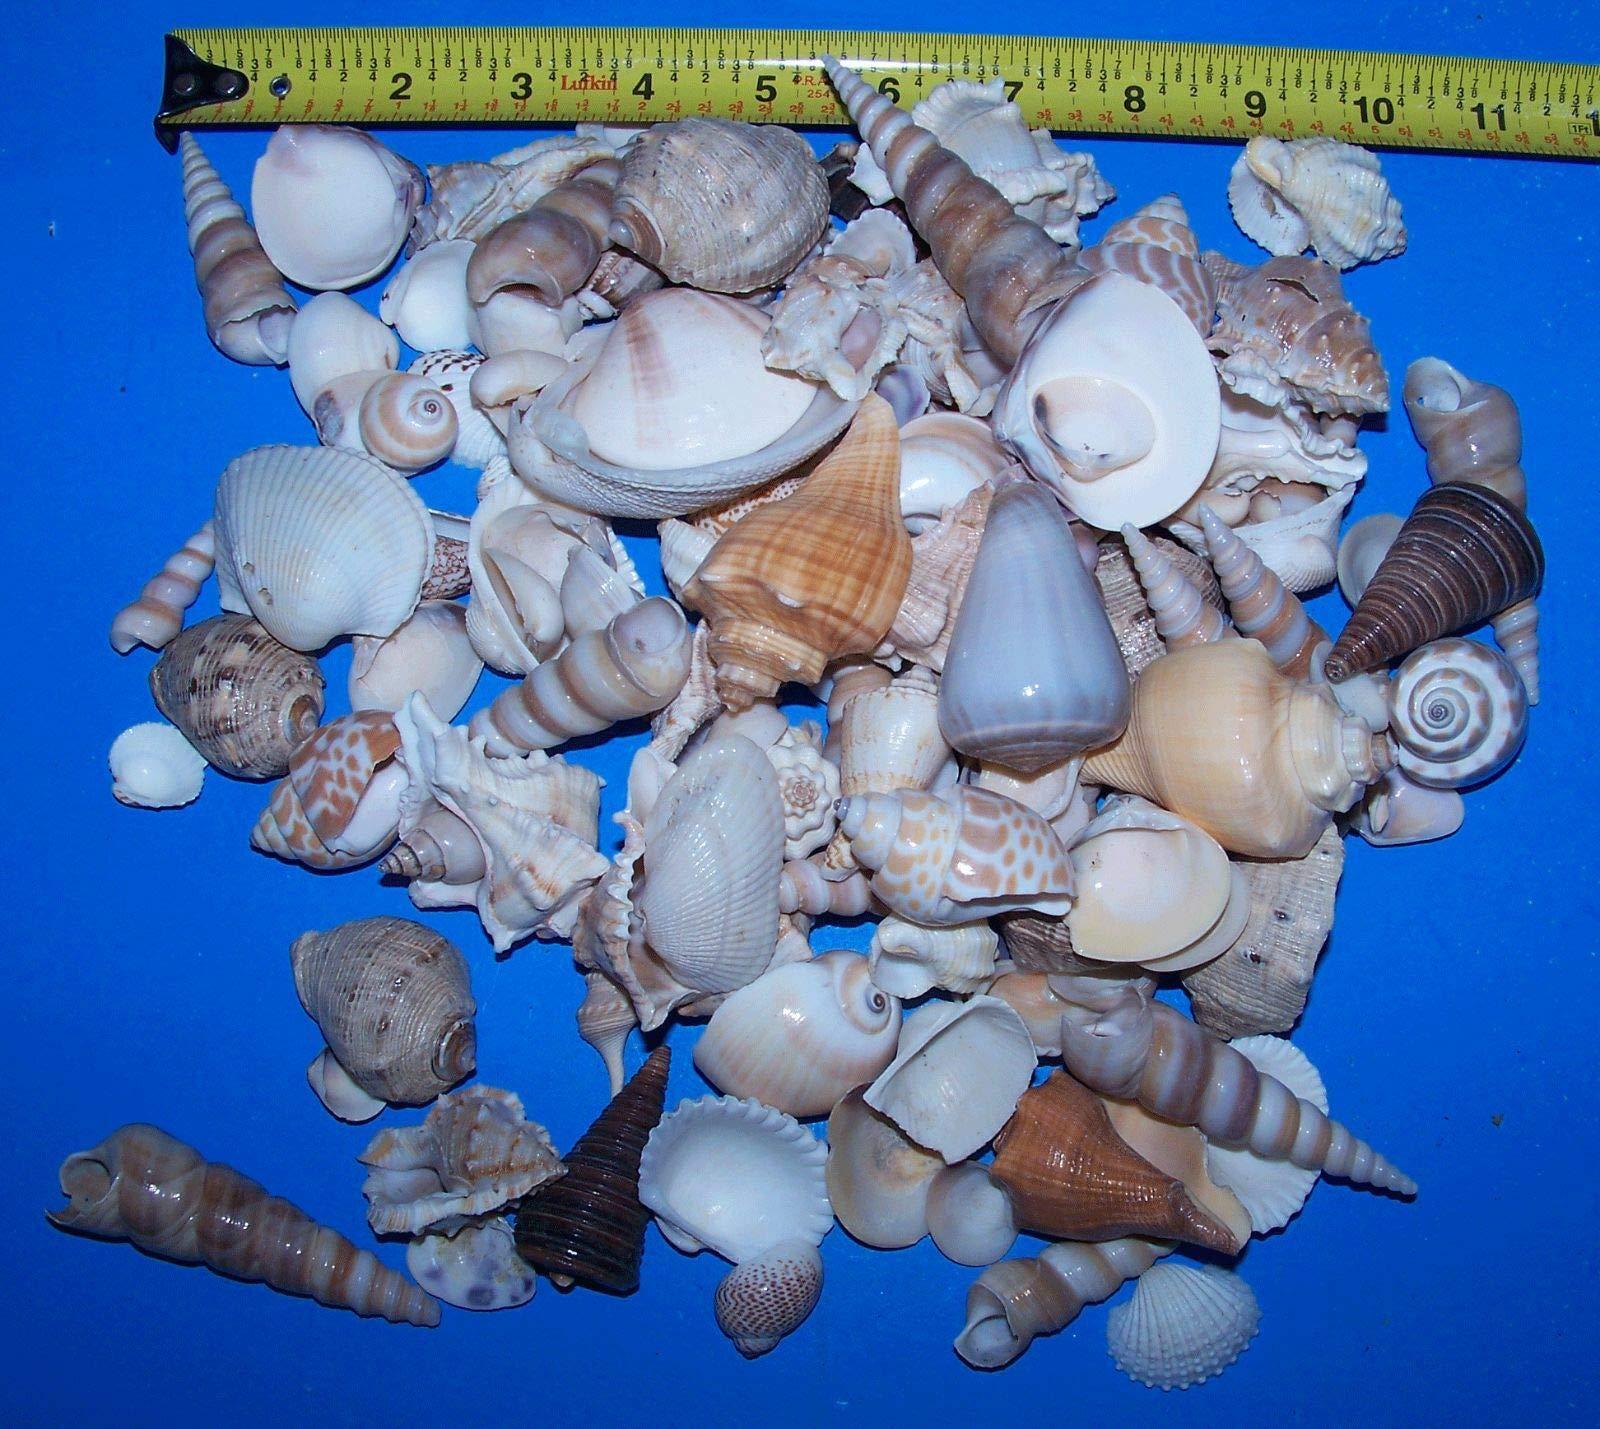 XLarge LOT 5+lbs Seashells 25 Starfish 5 Sand Dollars